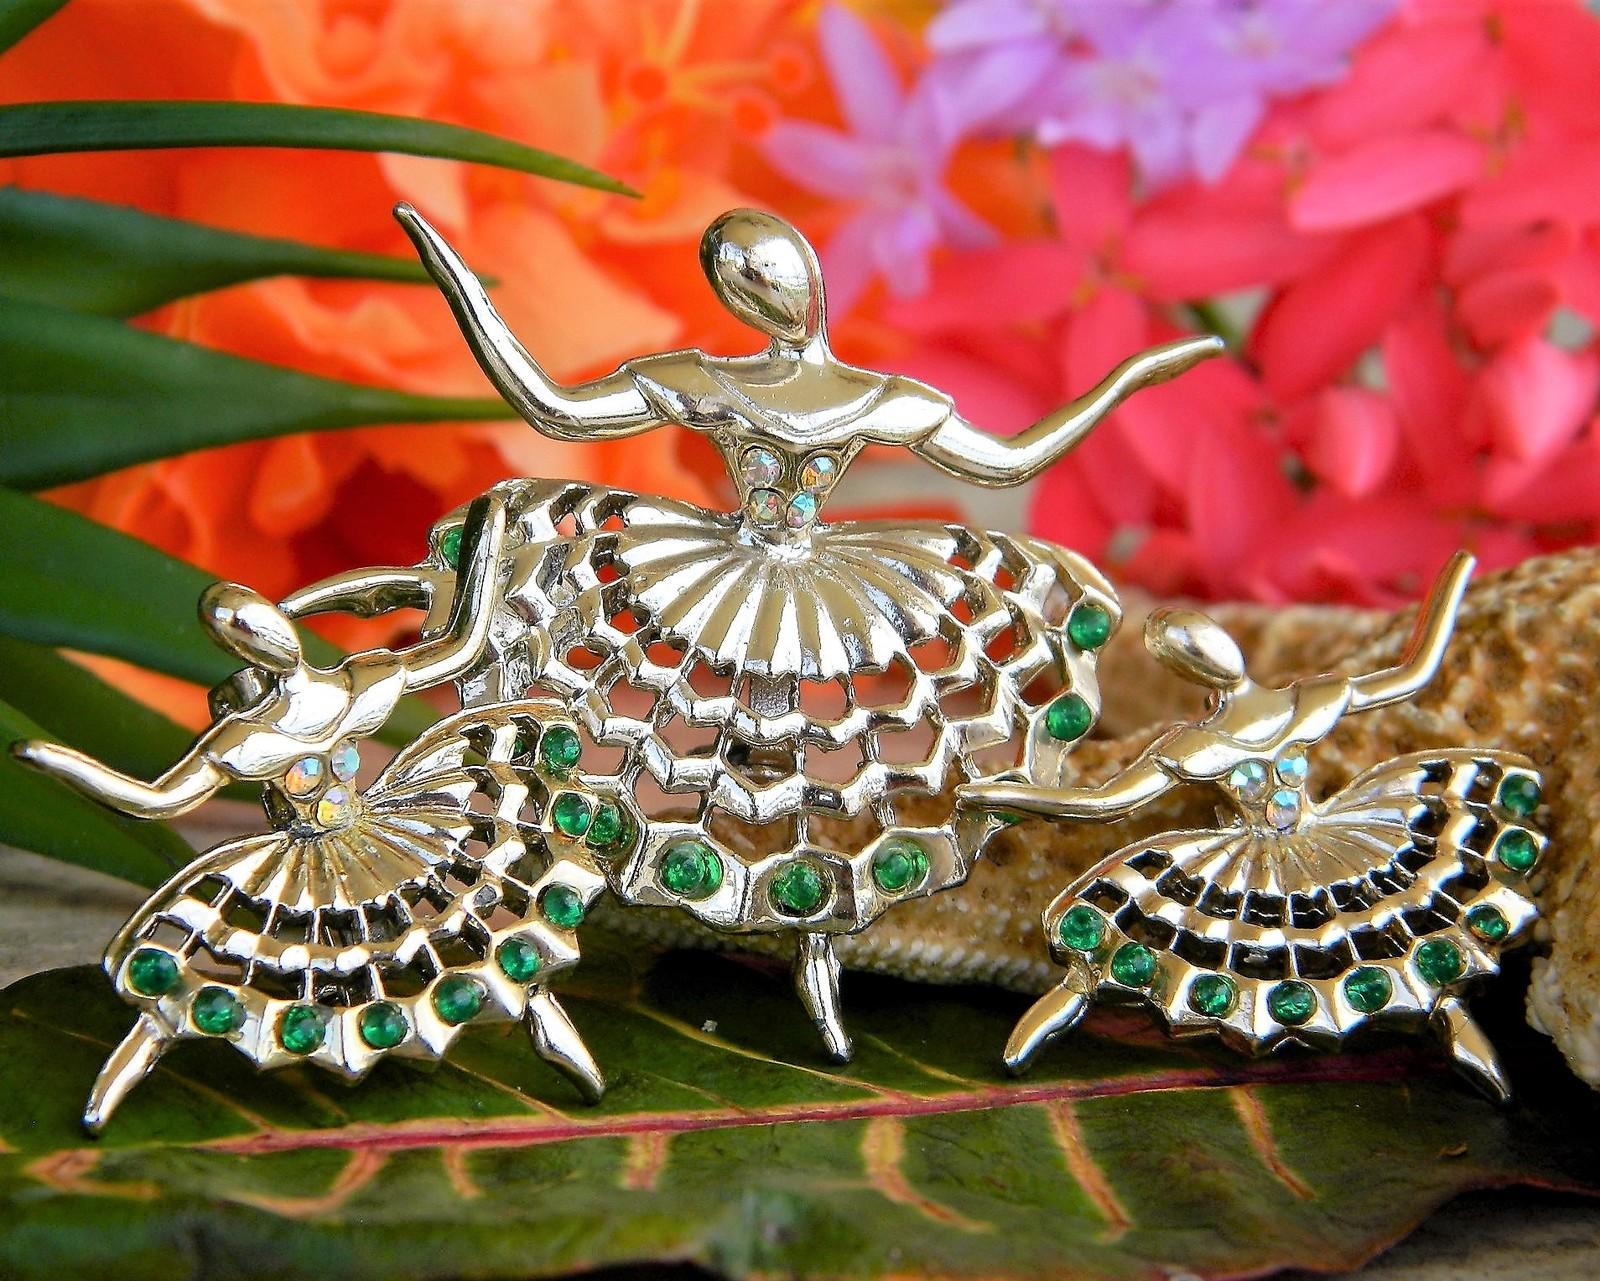 Vintage ballerina ballet dancers brooch pin rhinestones scatter set 3